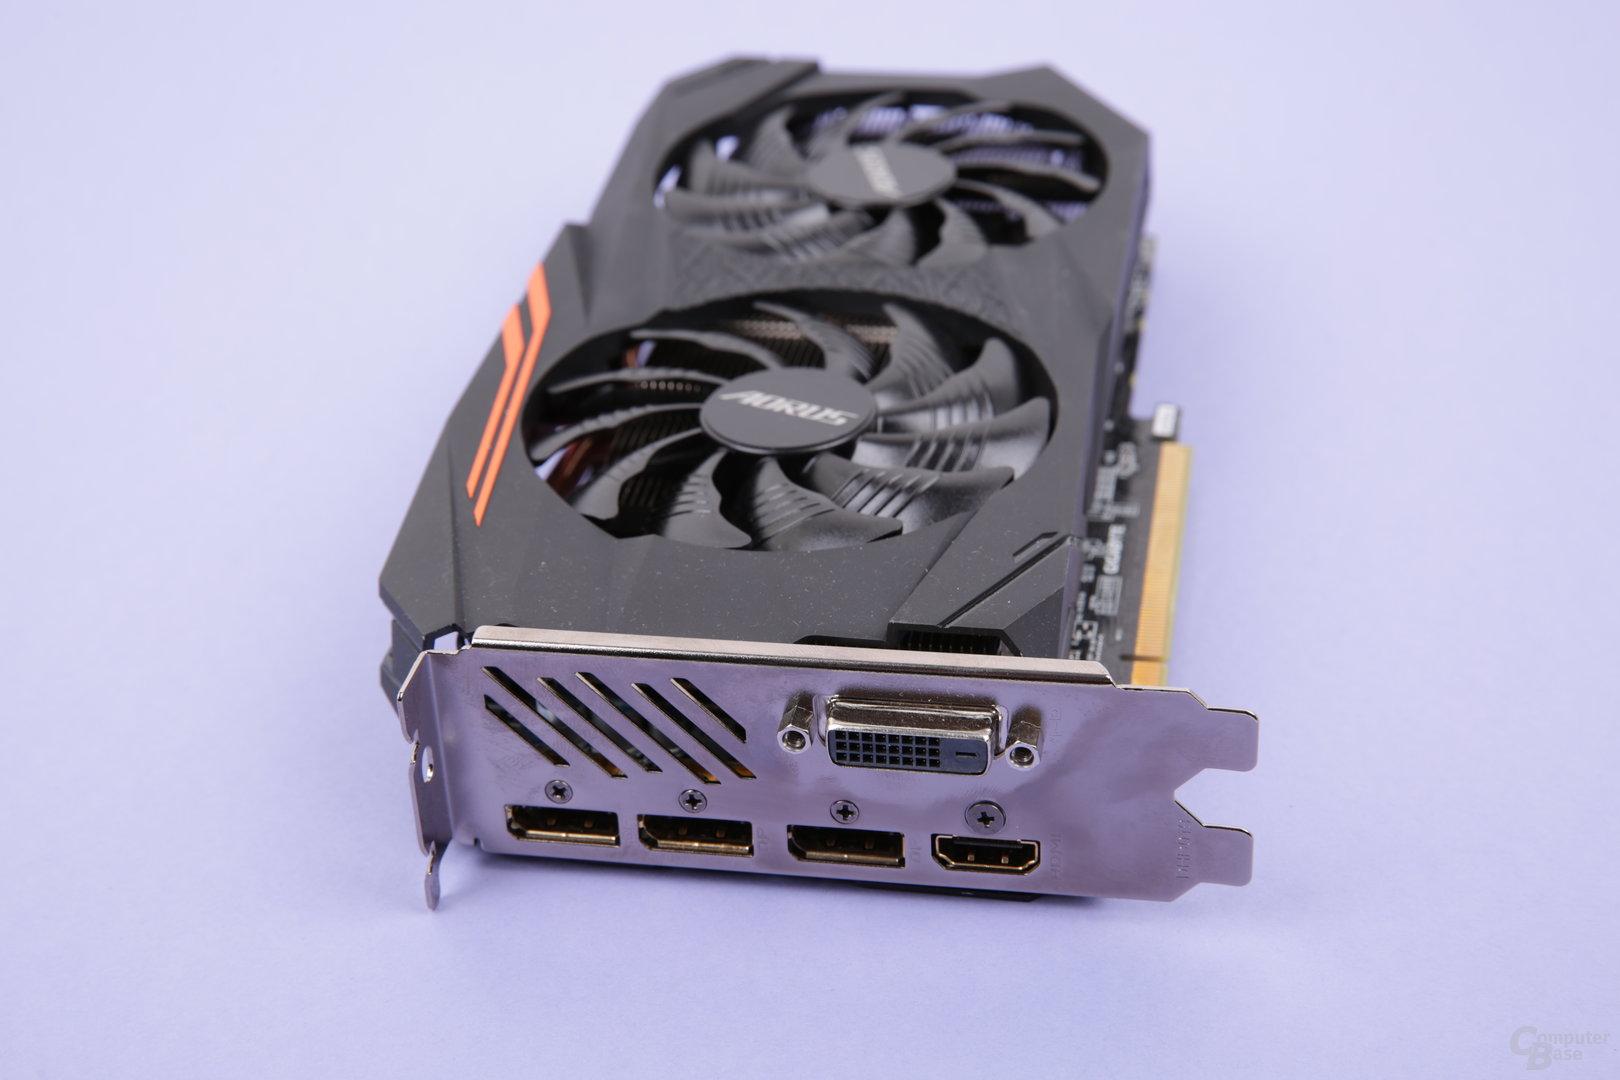 Gigabyte Radeon RX 570 Aorus